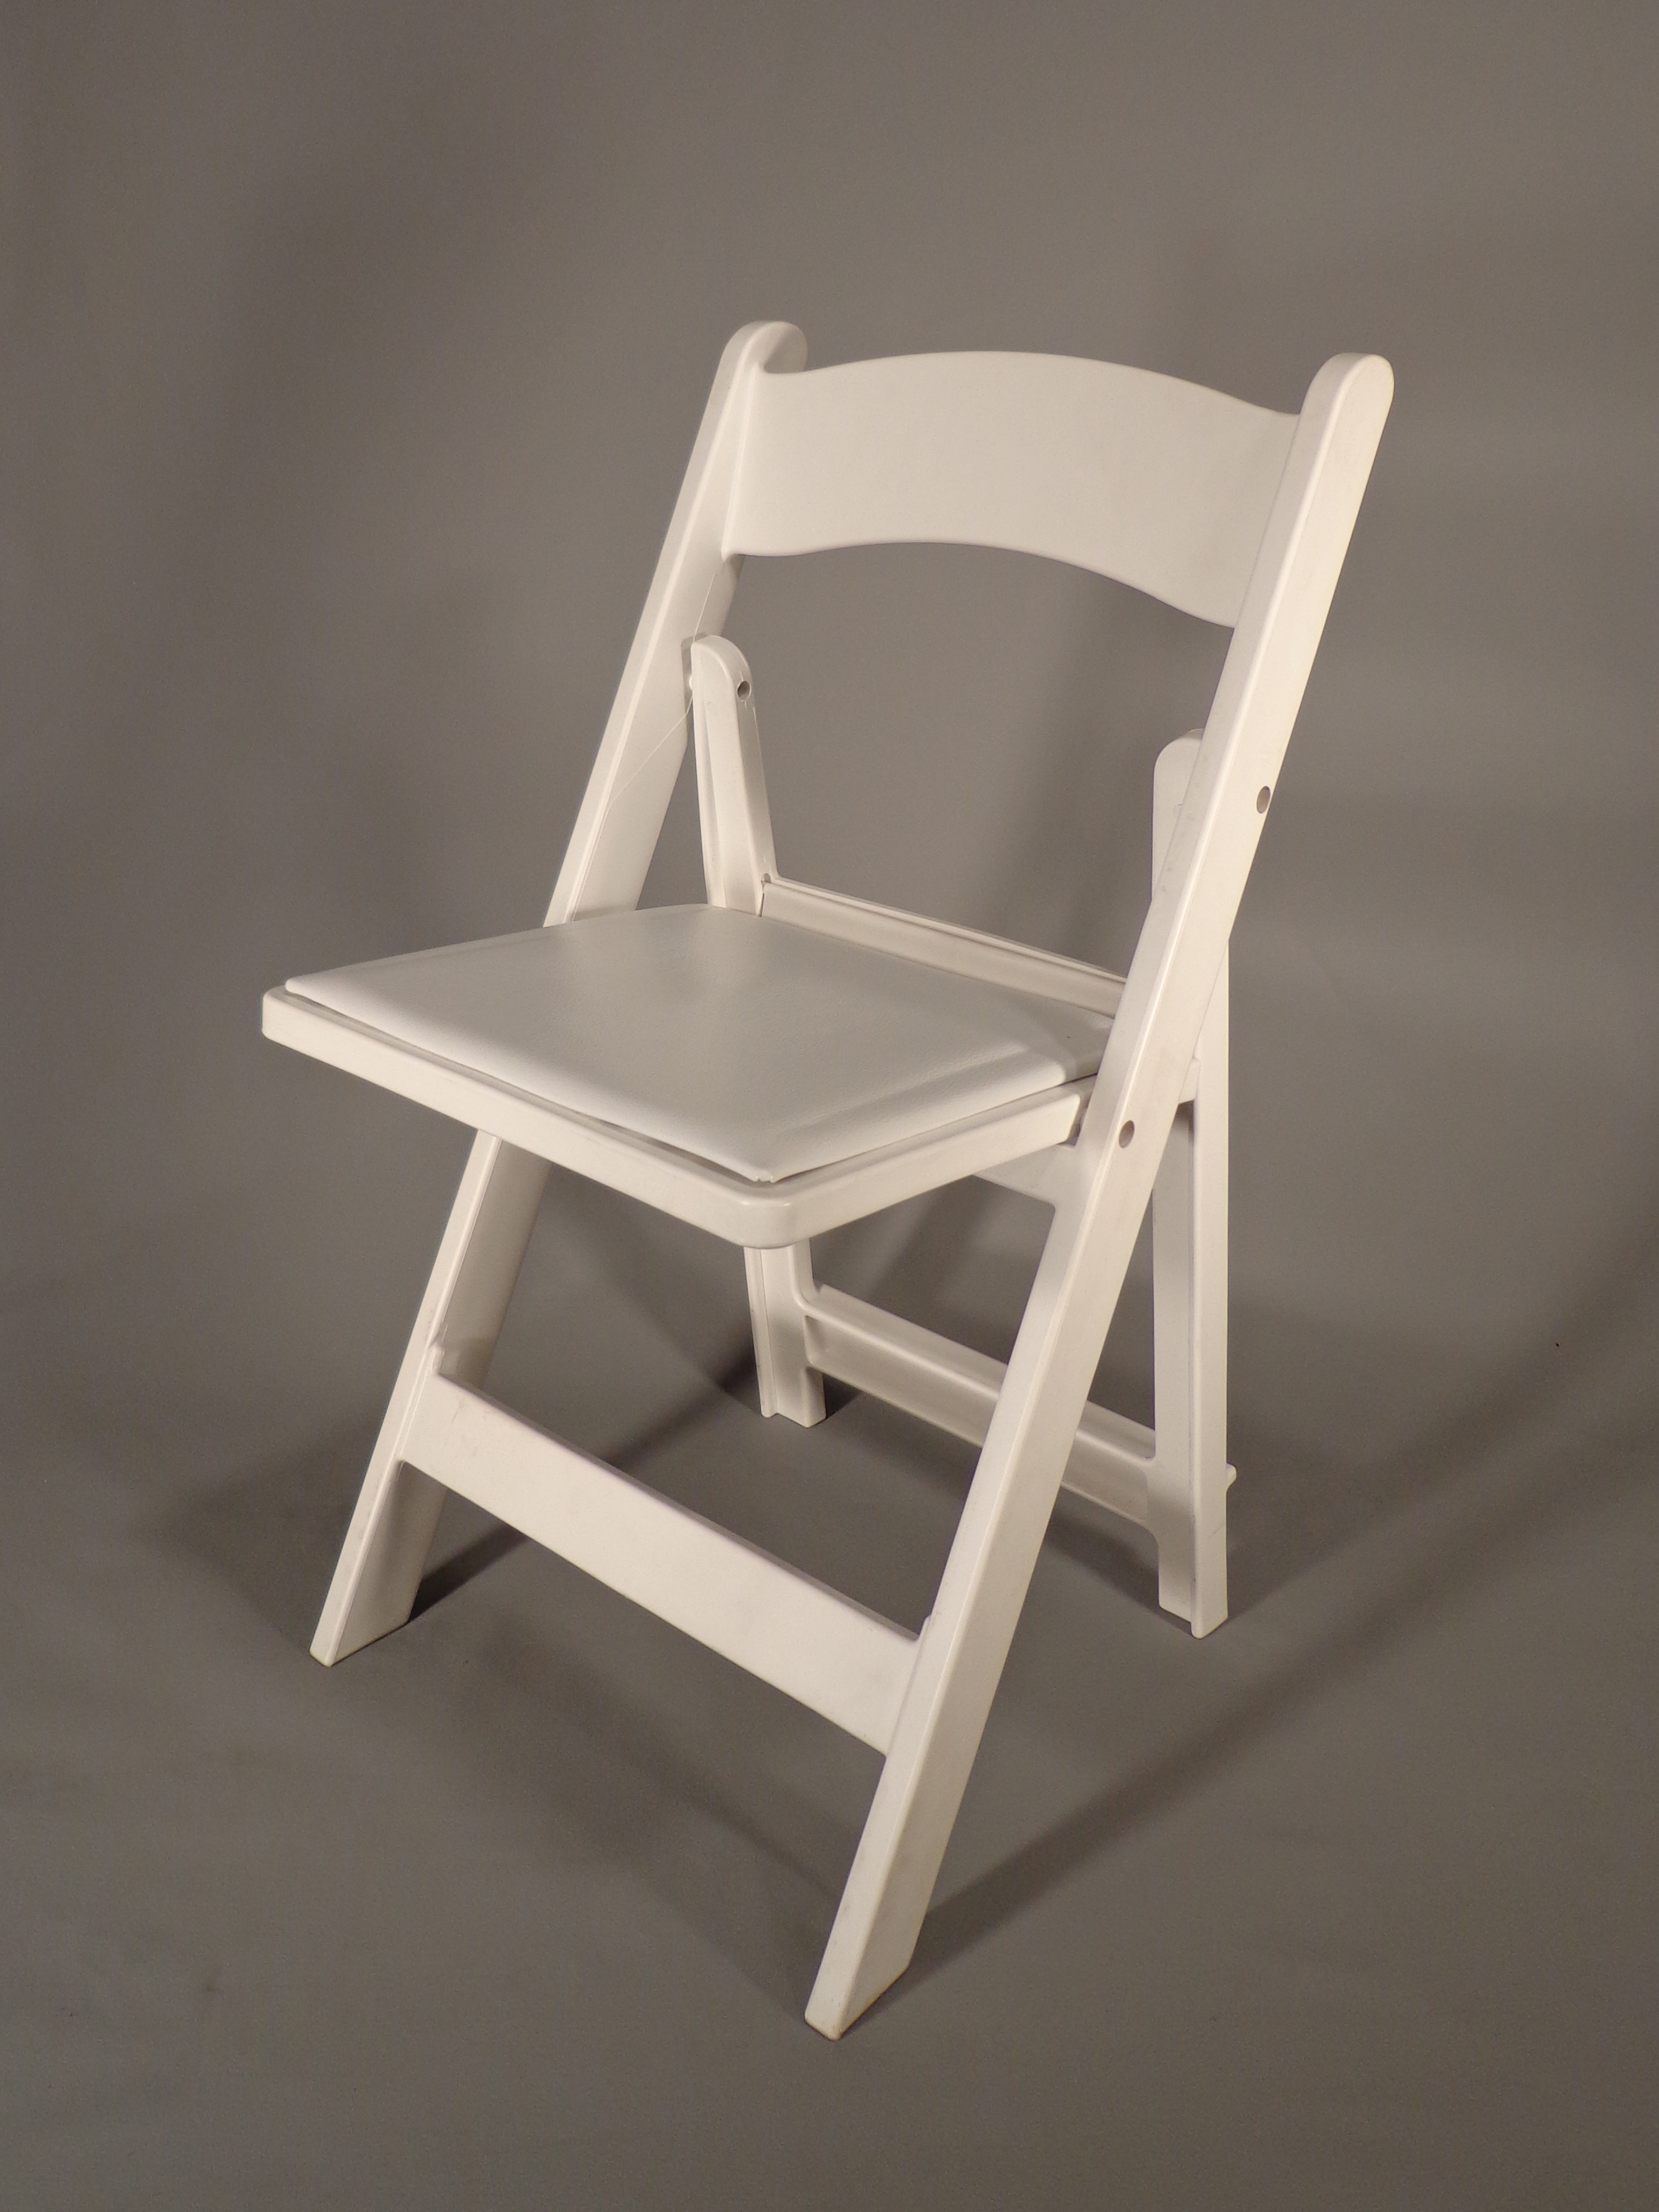 Resin folding chairs - Resin Folding White Wood Chair White Web